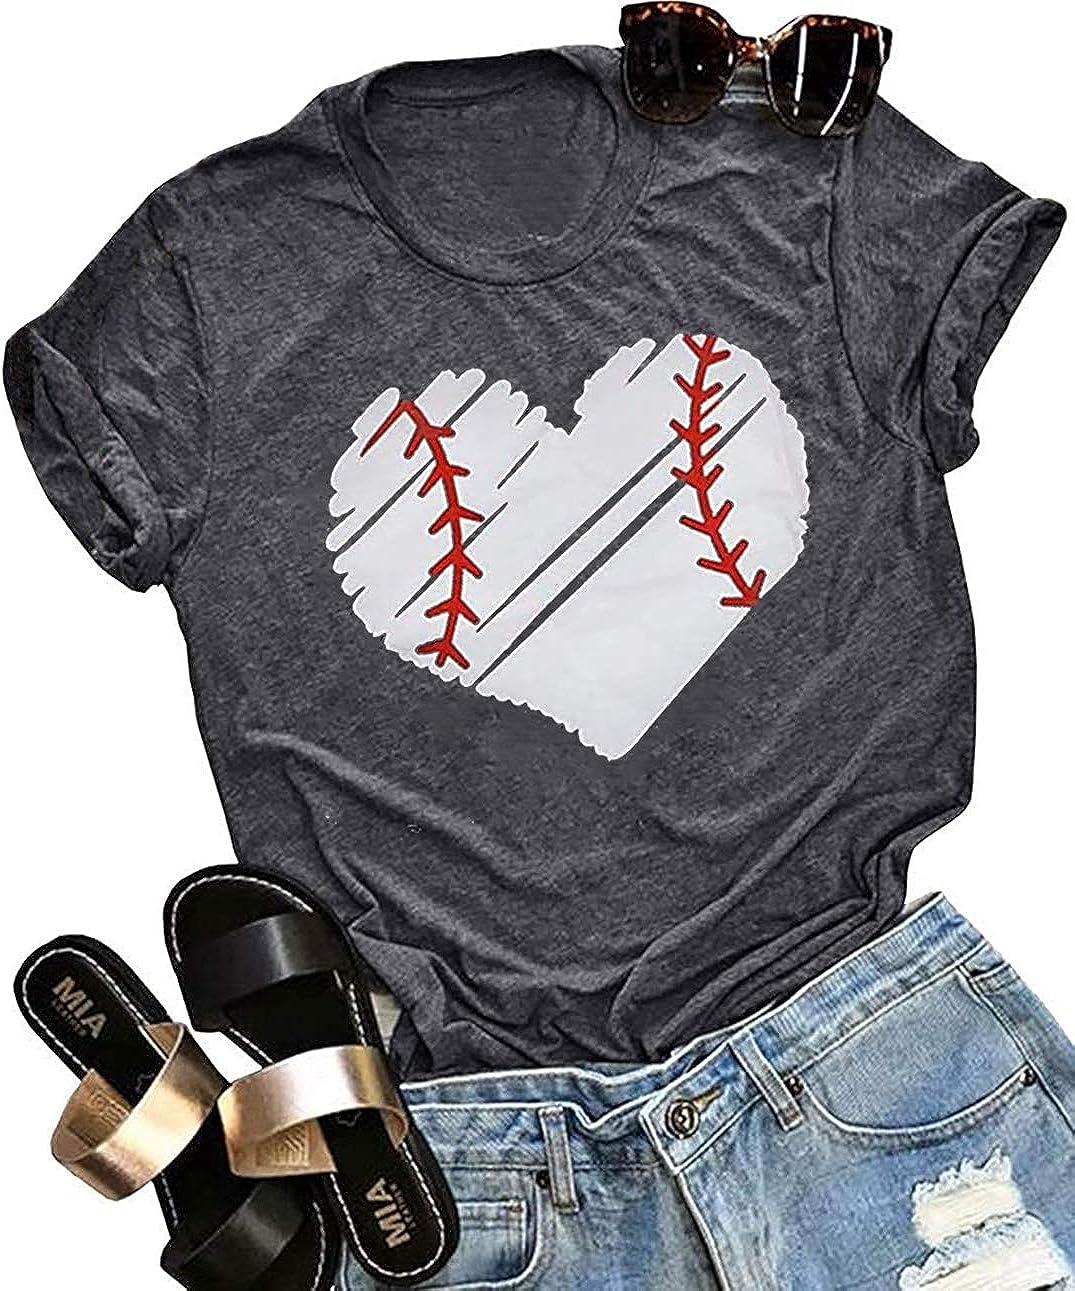 Kale Slogan Funny Novelty Cool Men Women Long Short Sleeve Baseball T Shirt 1404